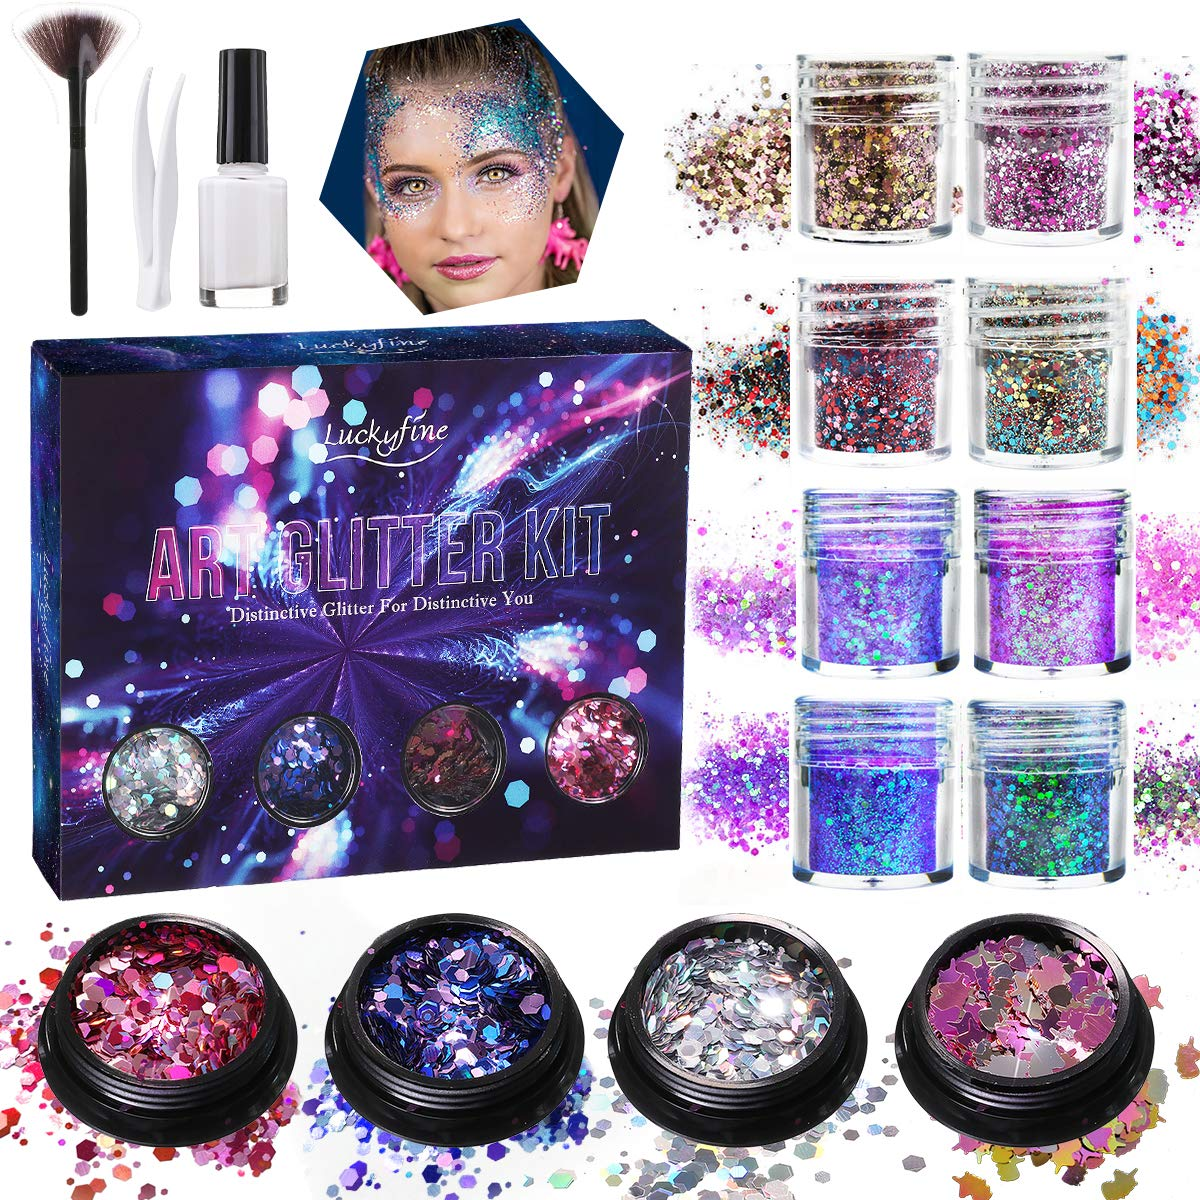 Chunky Glitter, Luckyfine Unicorn Chunky Glitter Makeup Chunky Glitter Sequins, for Nails Face Eyeshadow Lips Hair Body, Included Glue and Brush -12 Jars